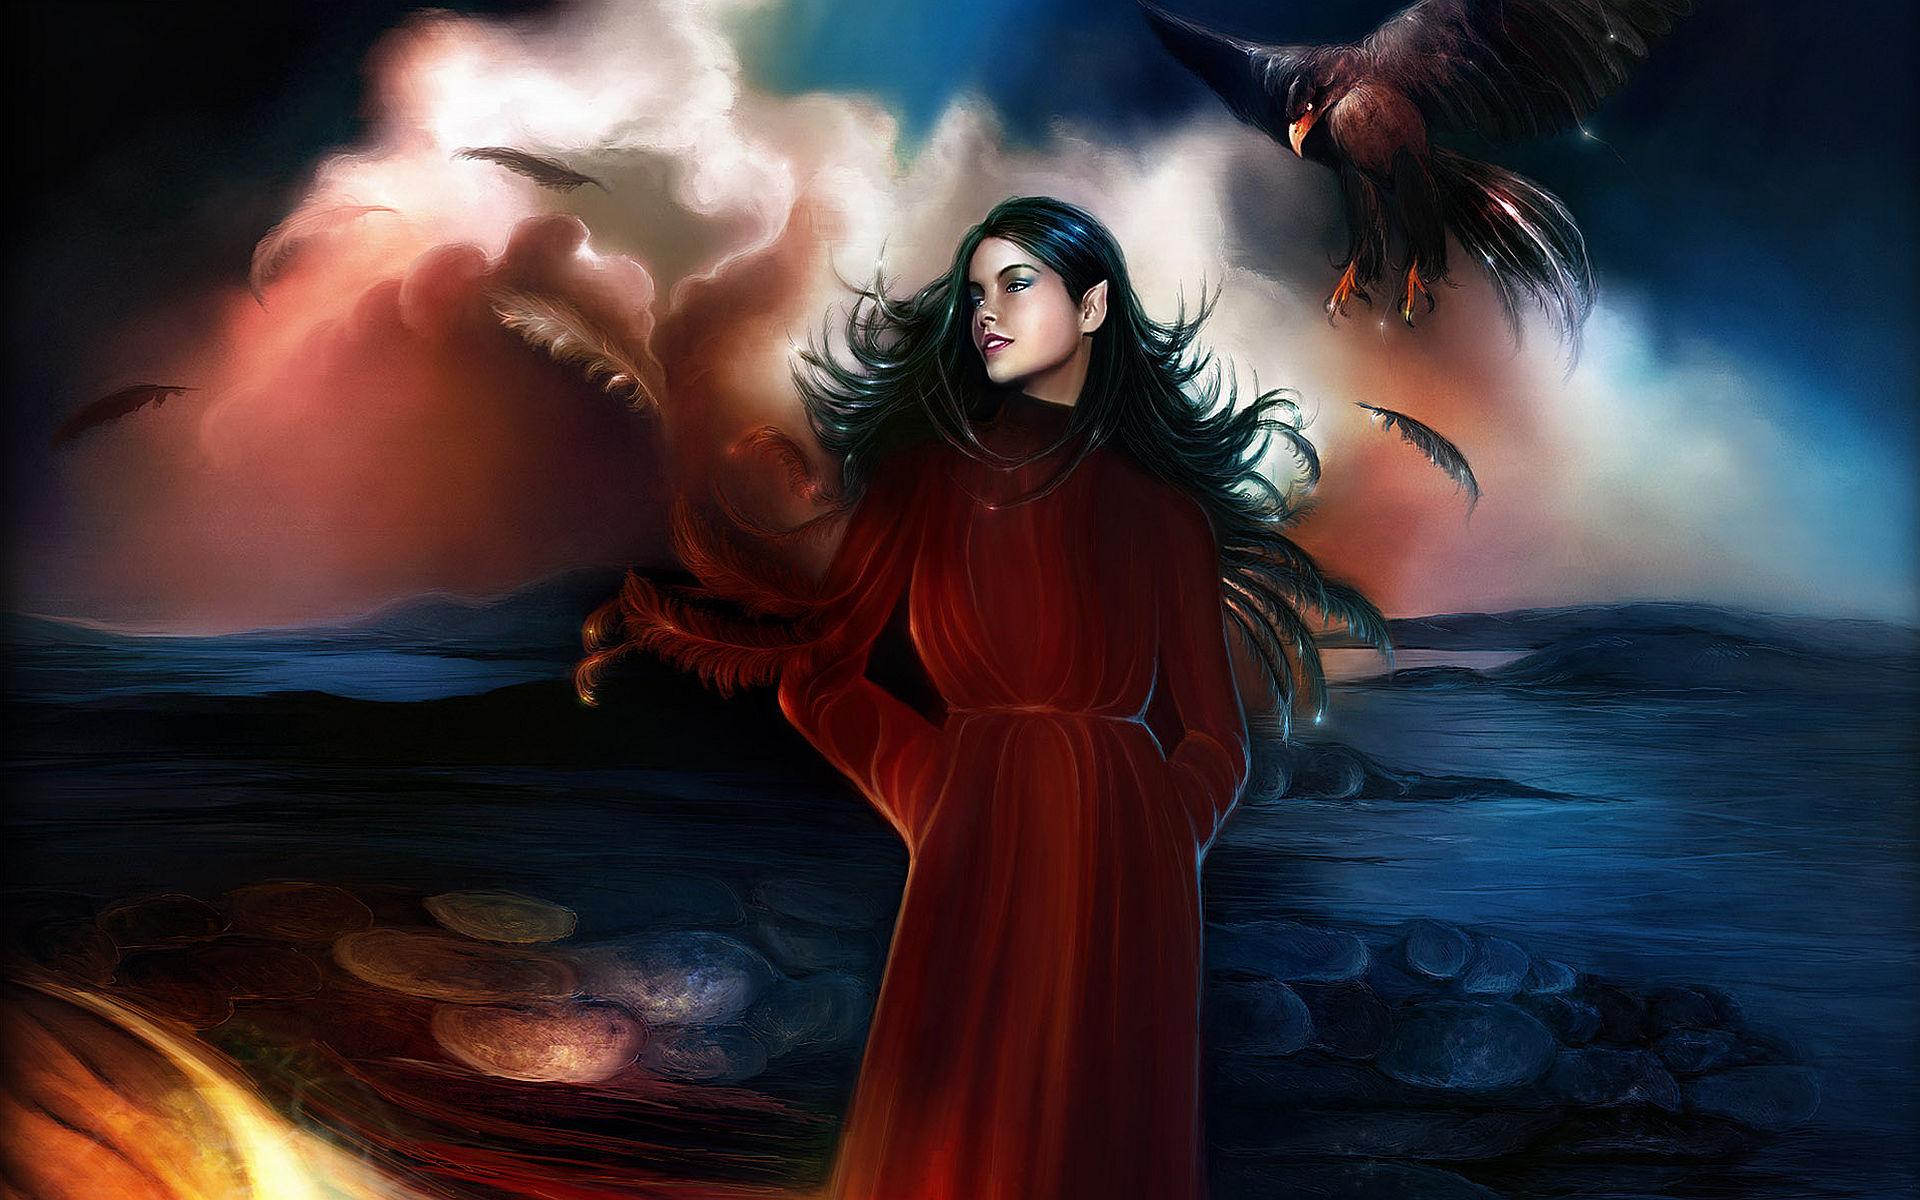 Fantasía - Elfo  Fantasía Pluma Woman Chica Pointed Ears Raven Black Hair Fondo de Pantalla